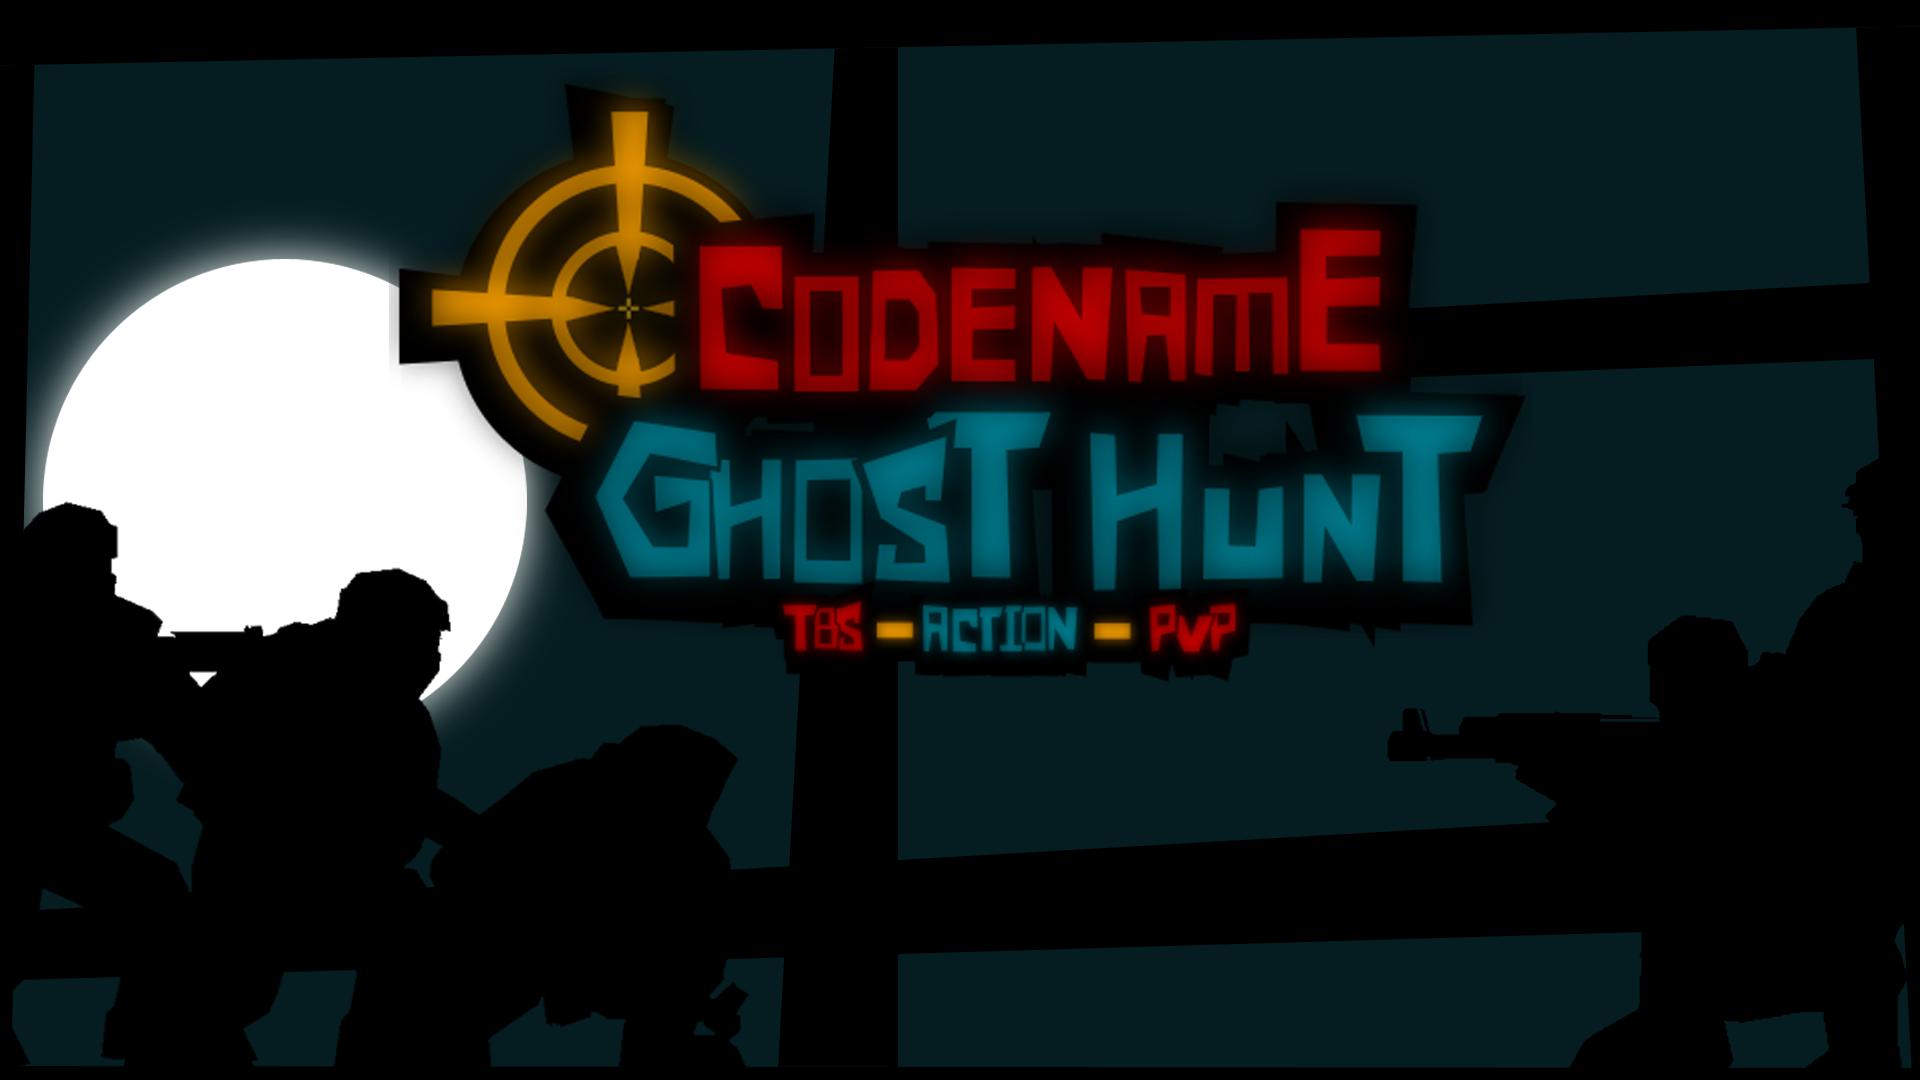 Codename: Ghost Hunt